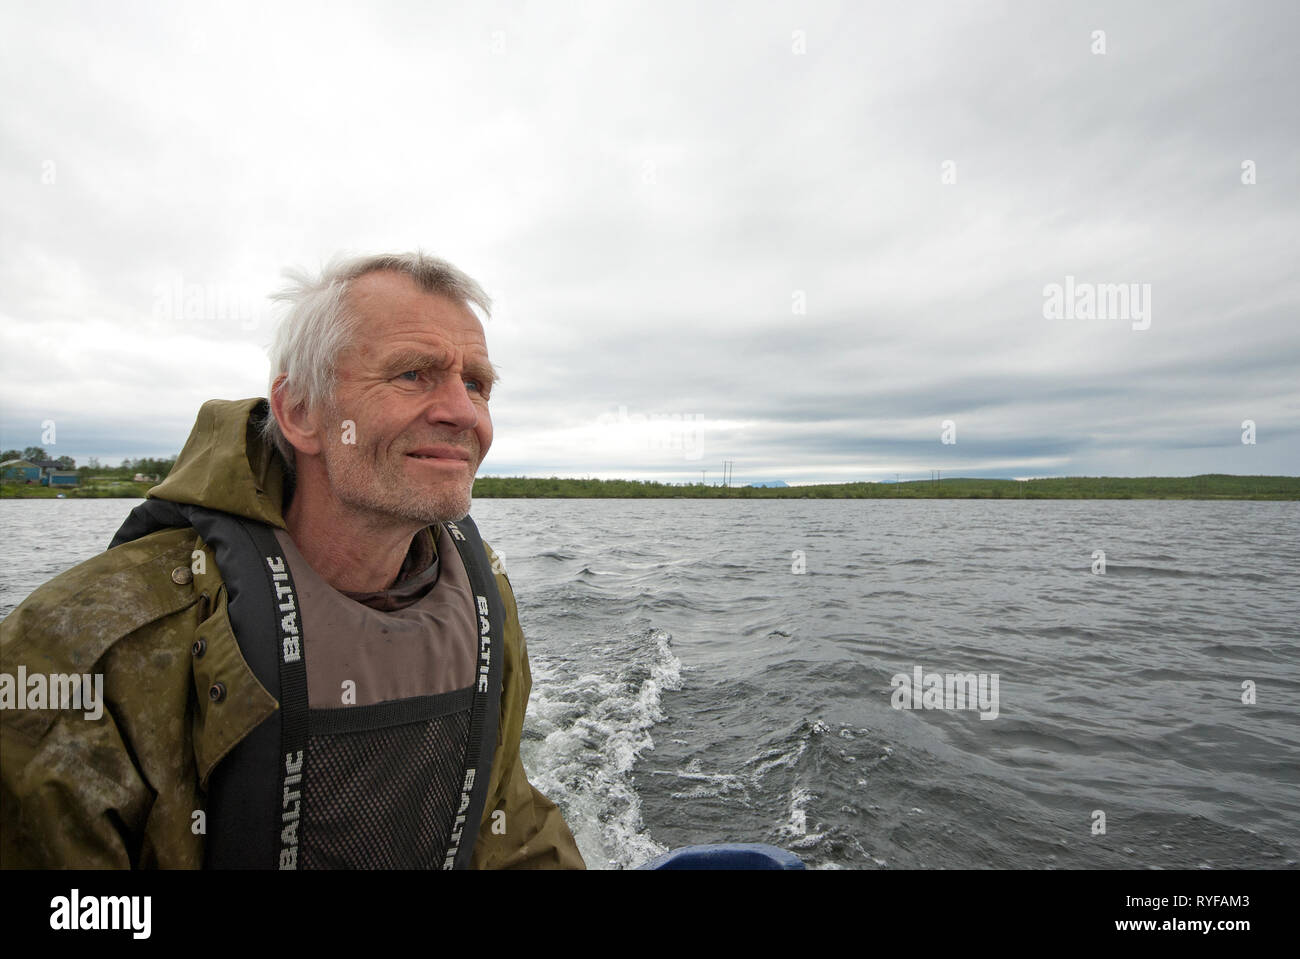 The outdoor guide and musher Sven Engholm at Nattvann lake, Karasjok, Finnmark County, Norway - Stock Image